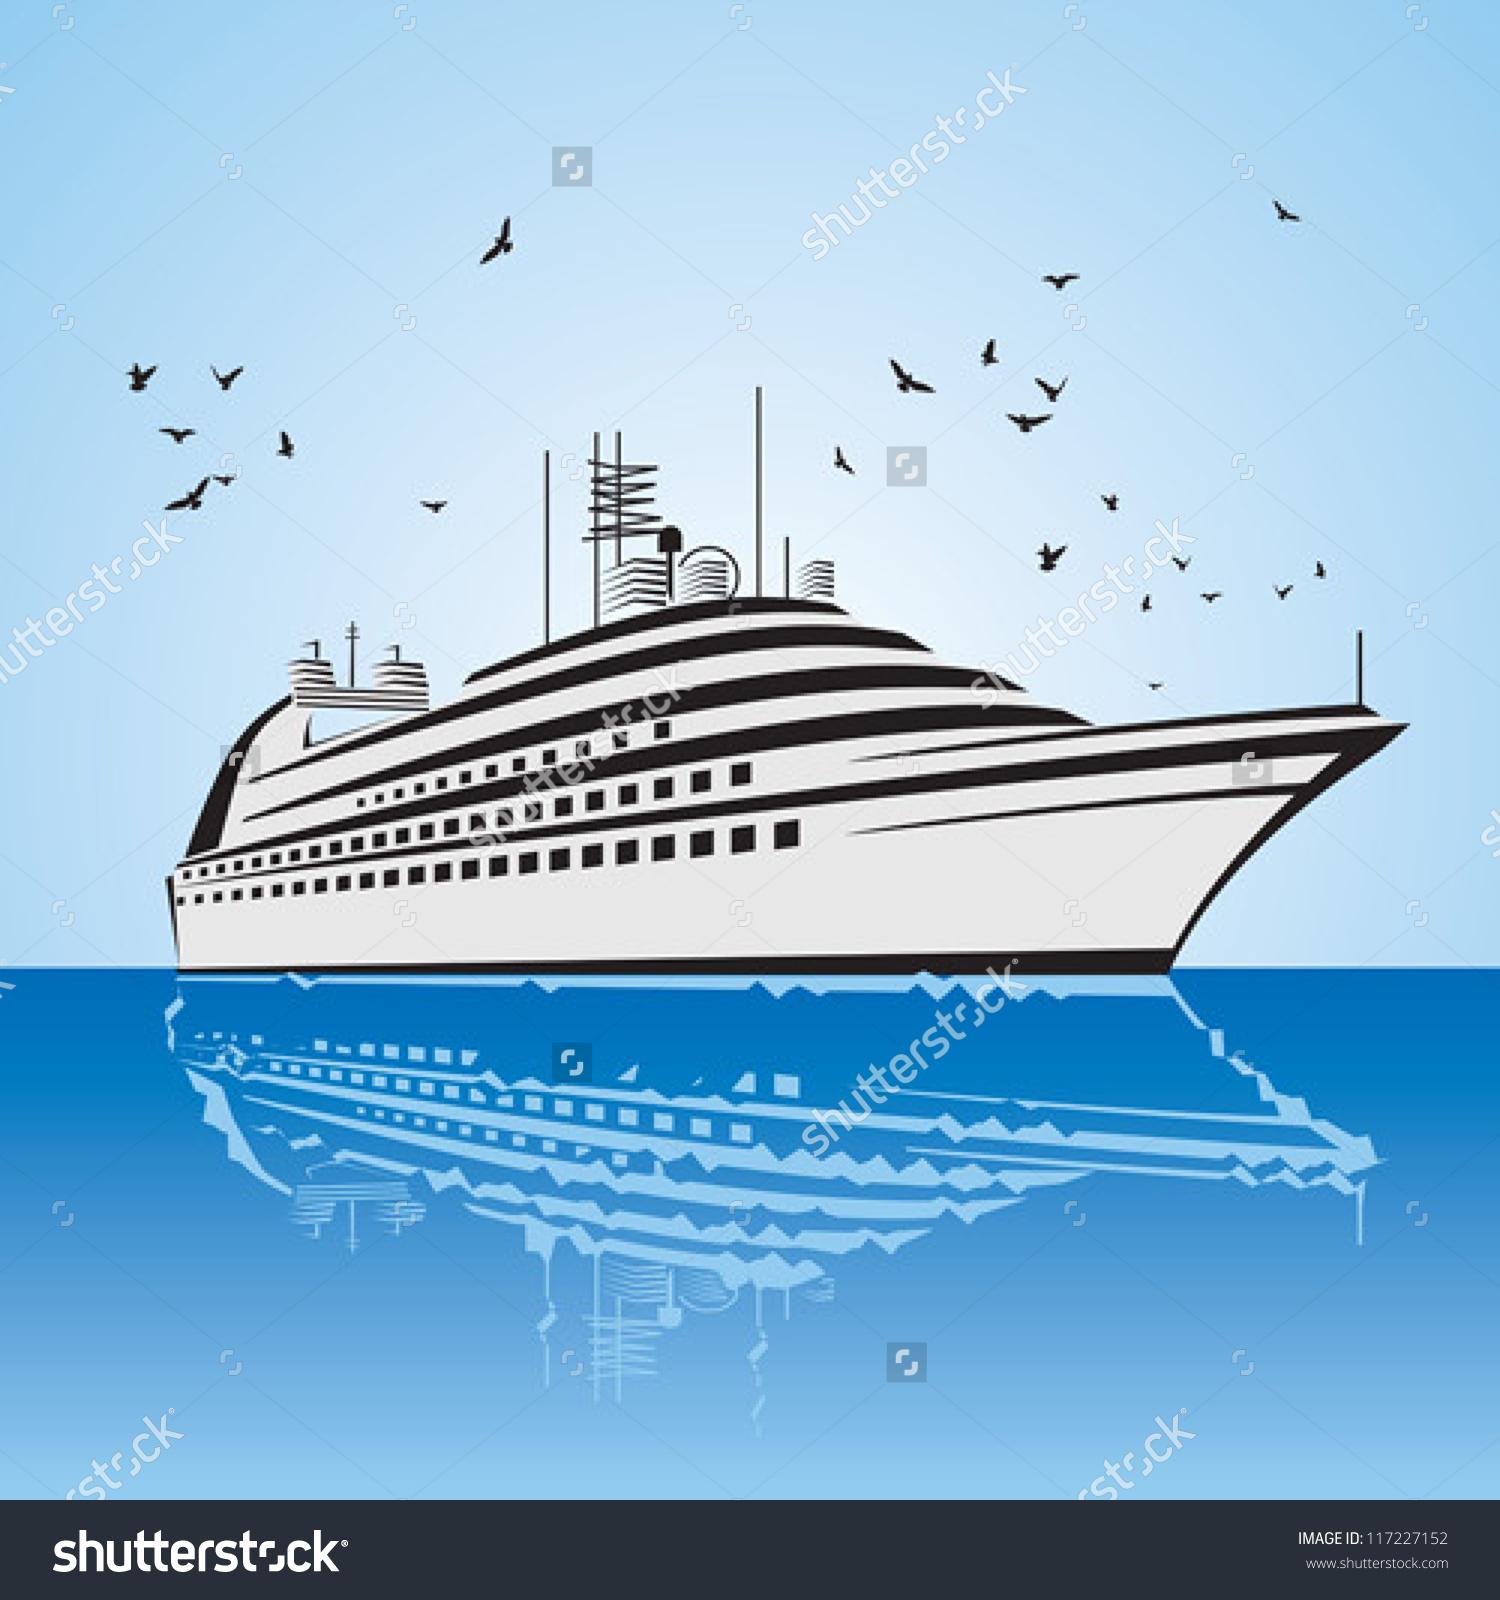 Very Realistic View Cruise Ship Similar Stock Vector 117227152.